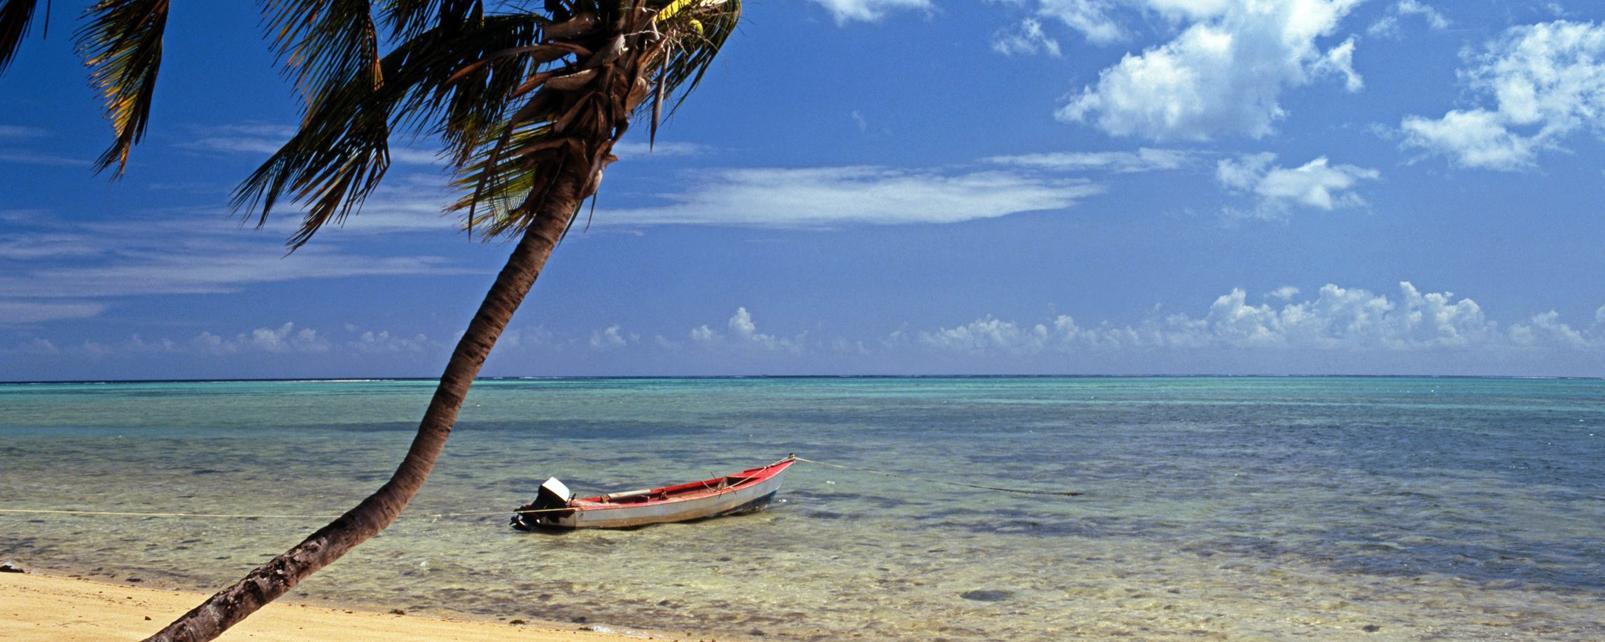 Caraïbes; Caraibes; Trinidad et Tobago; Scarborough;